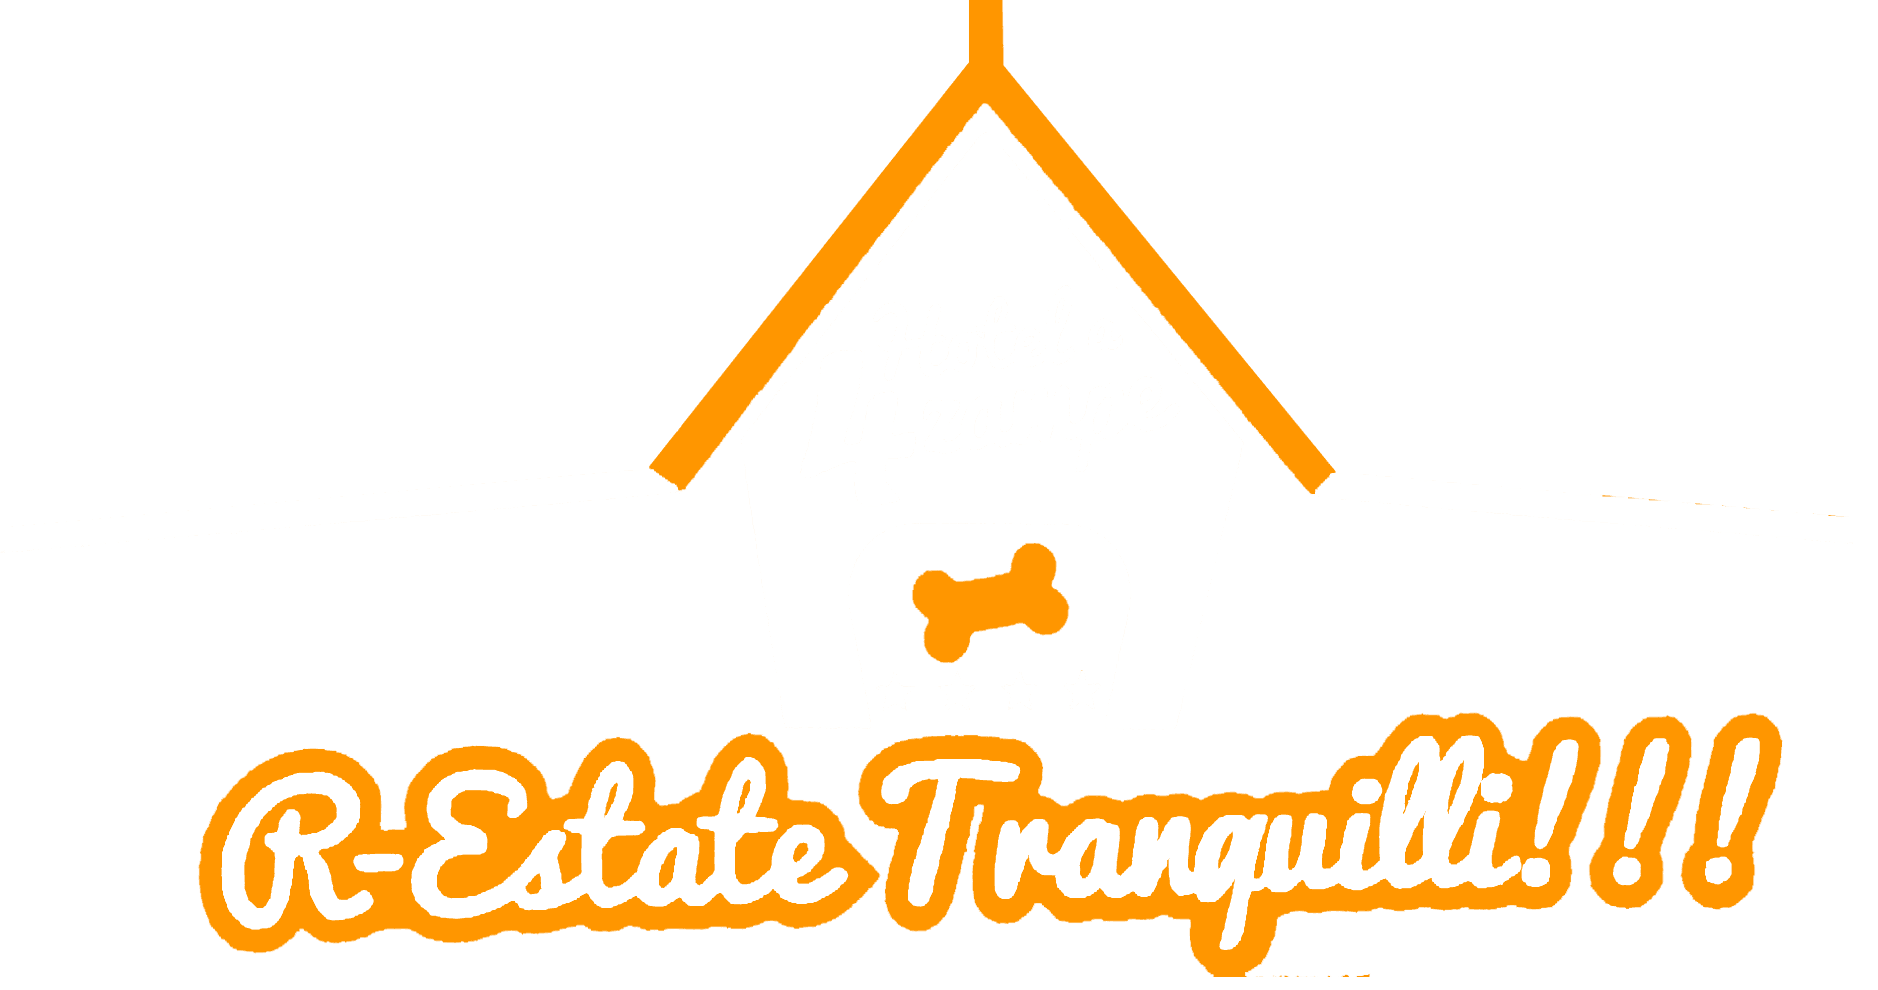 HOTEL A QUATTRO ZAMPE - LOGO